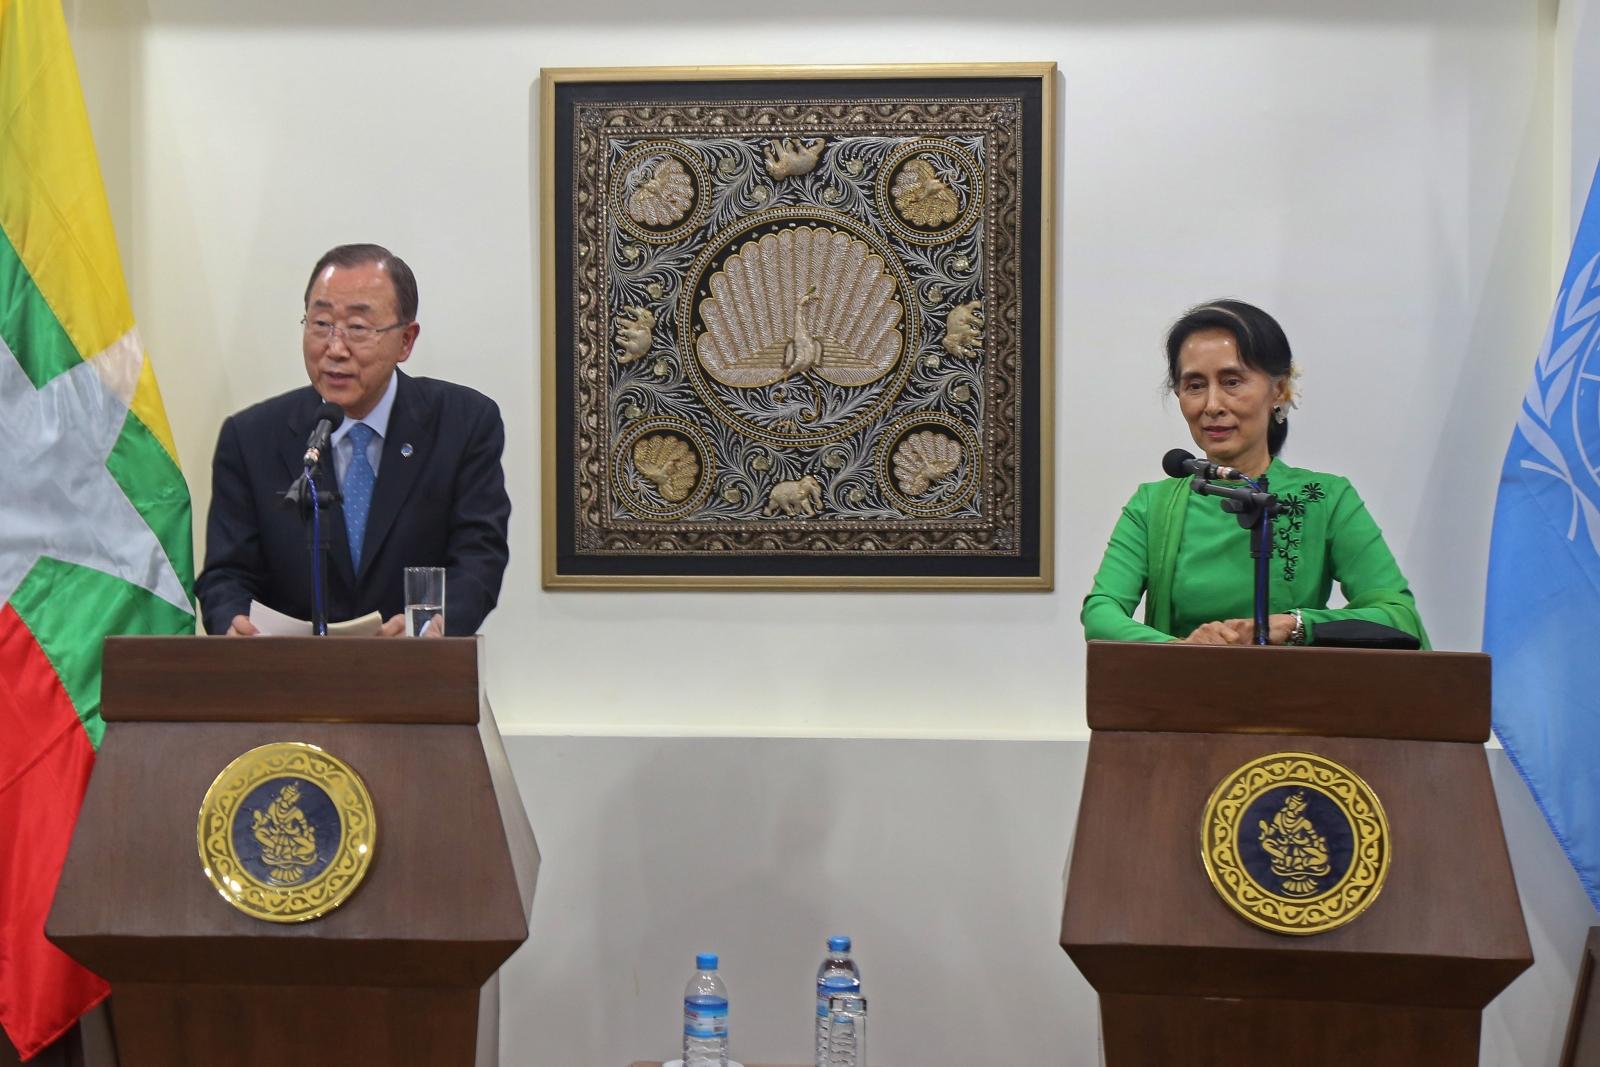 Myanmar peace talks Aung San Suu Kyi